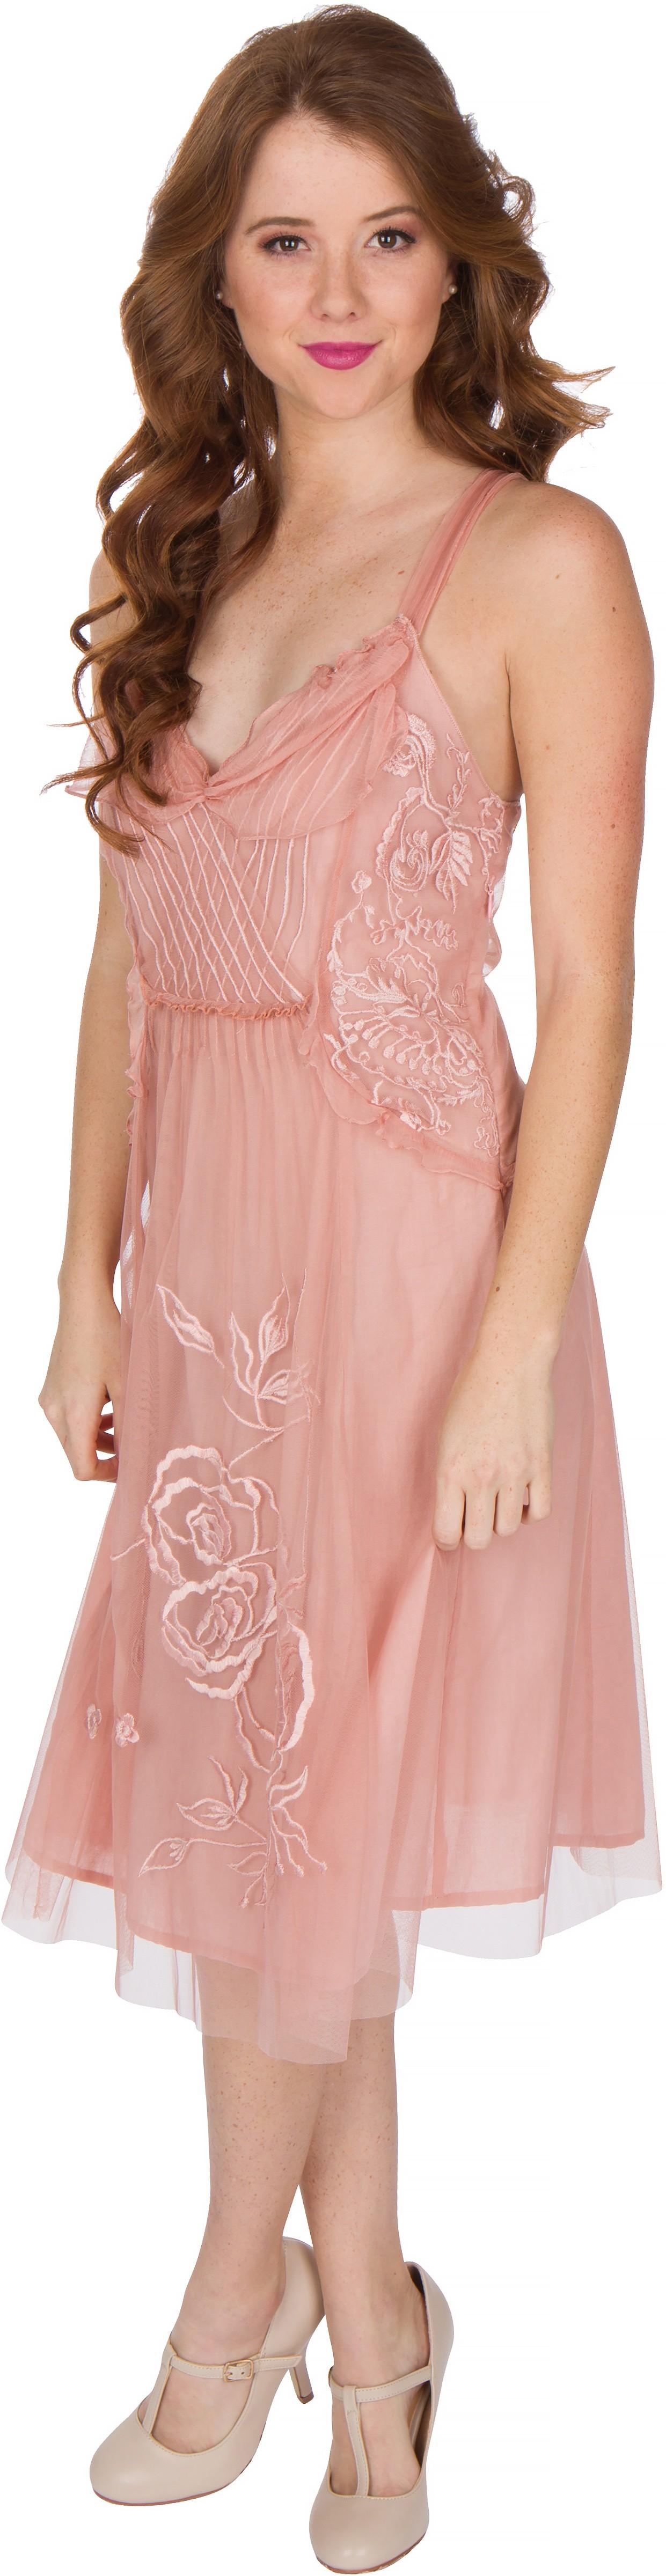 Alana Vintage Style Party Dress in Soft Pink by Nataya